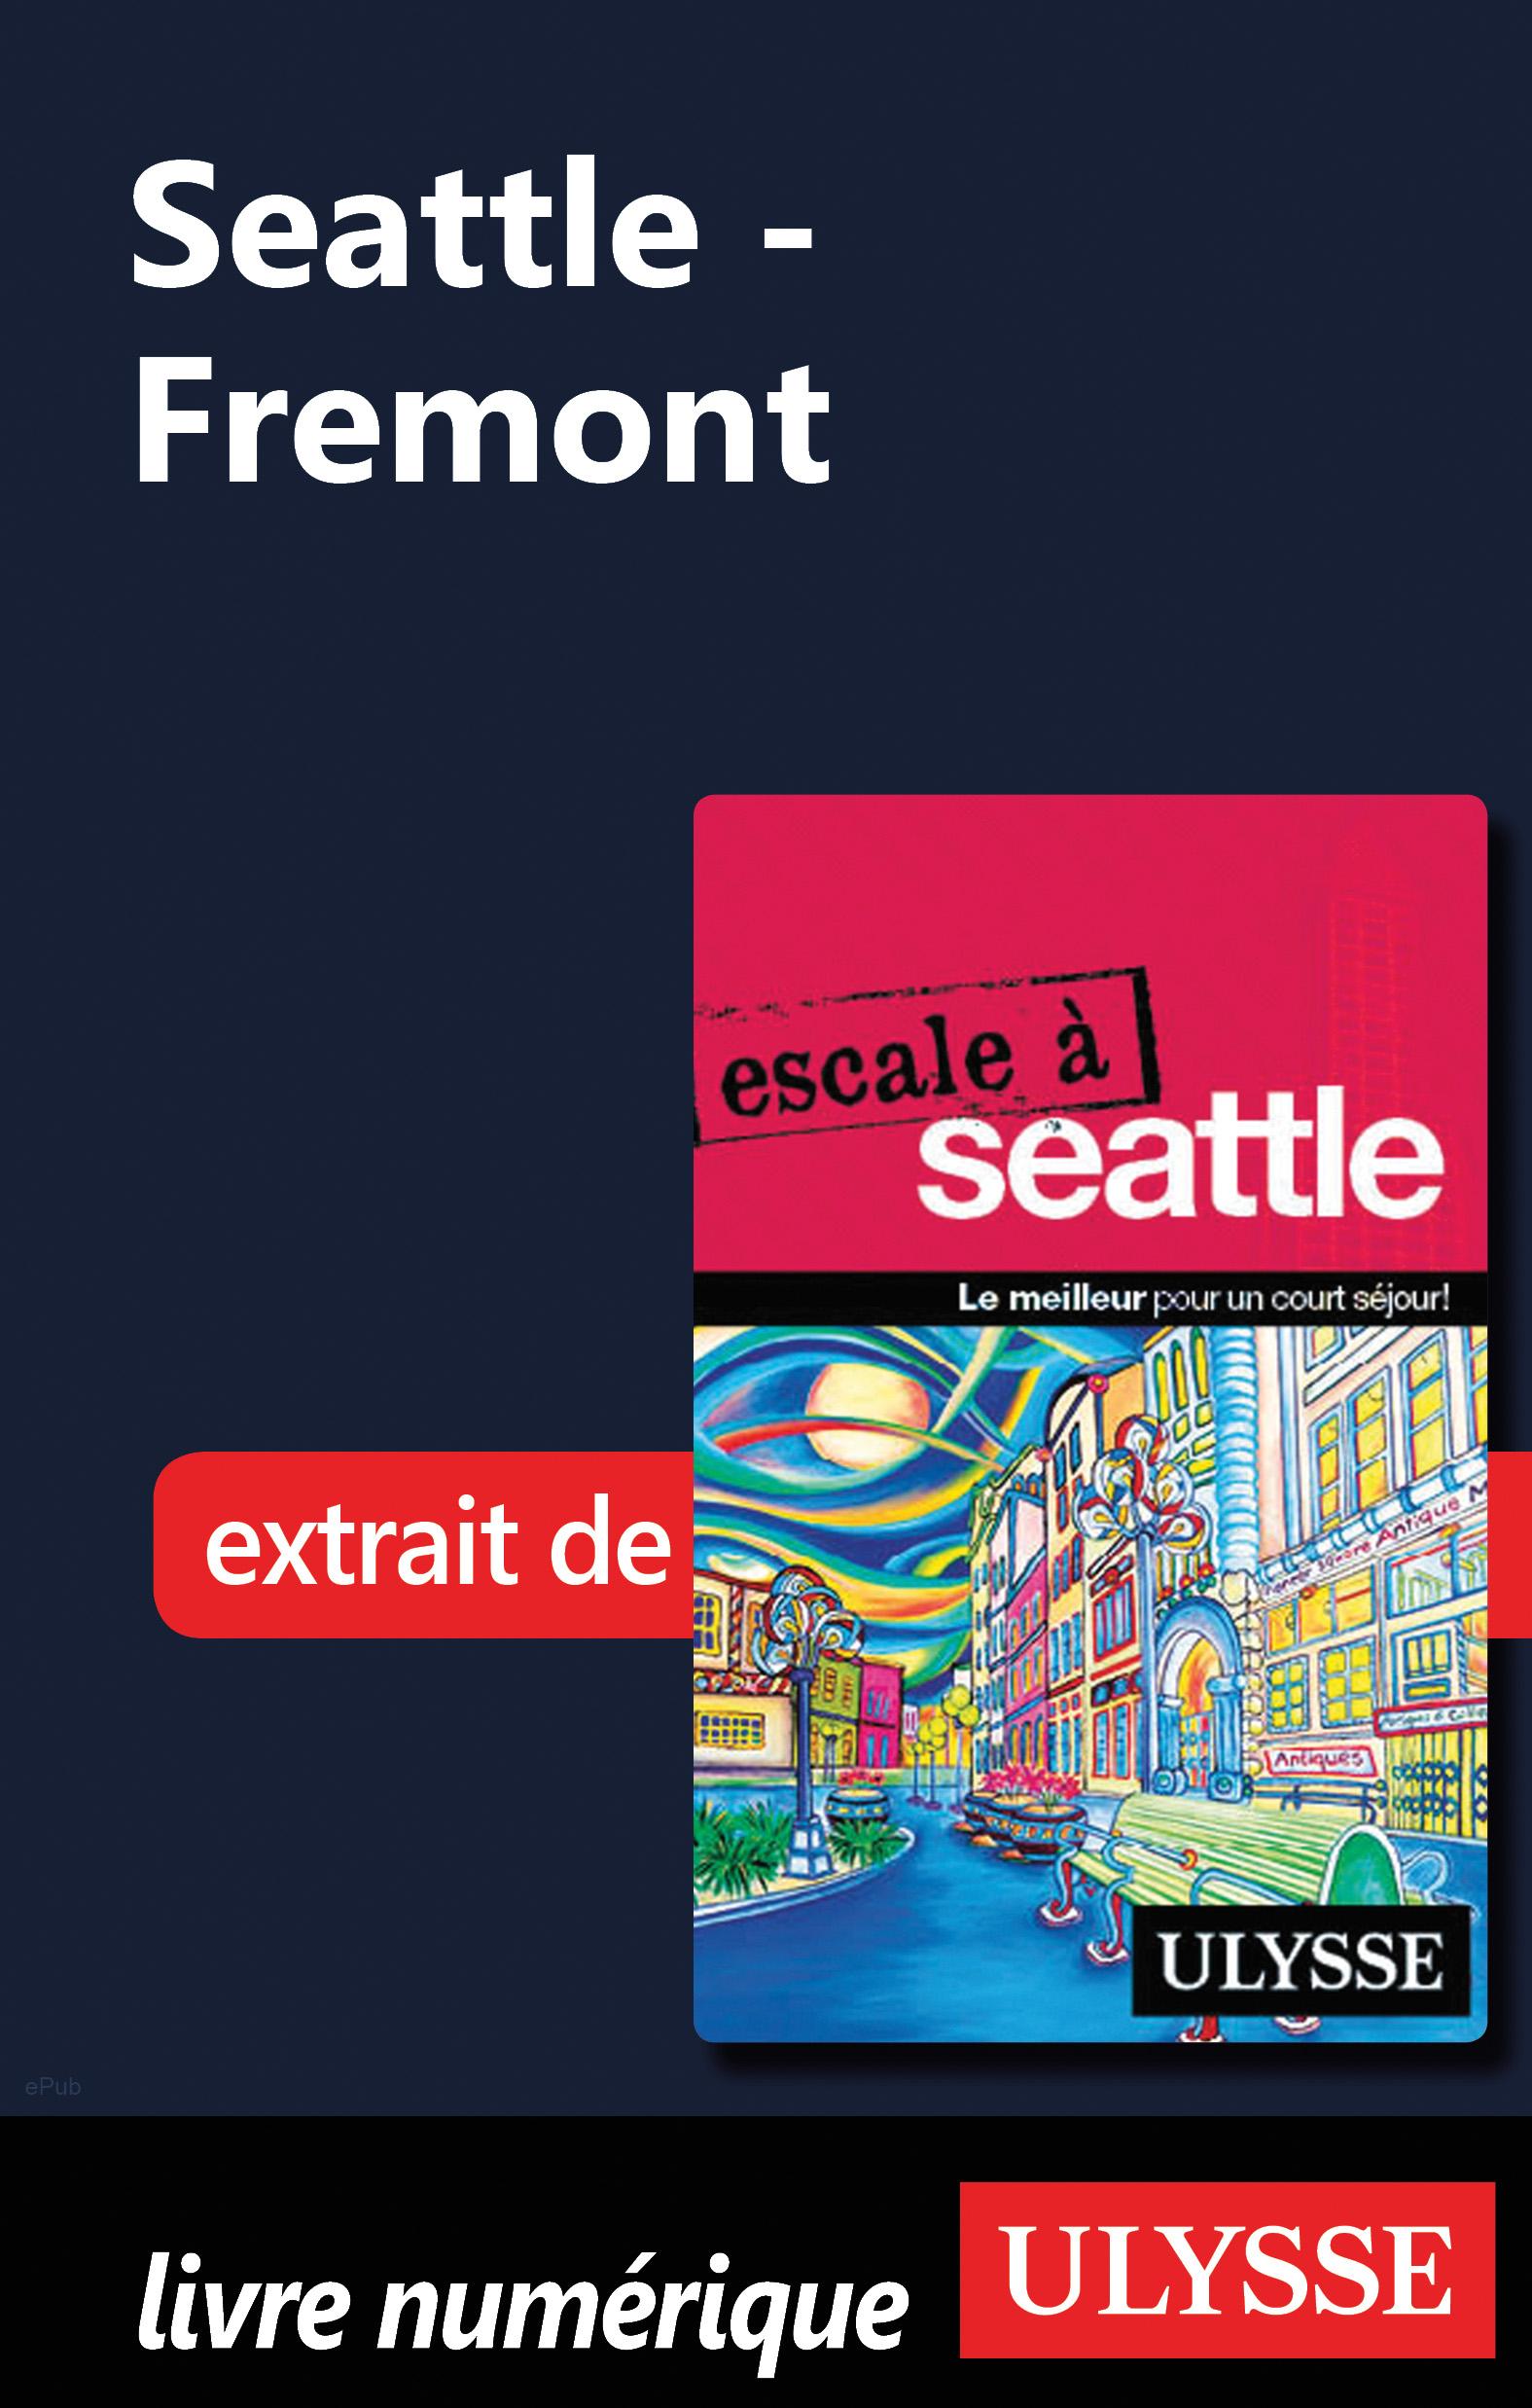 Seattle - Fremont